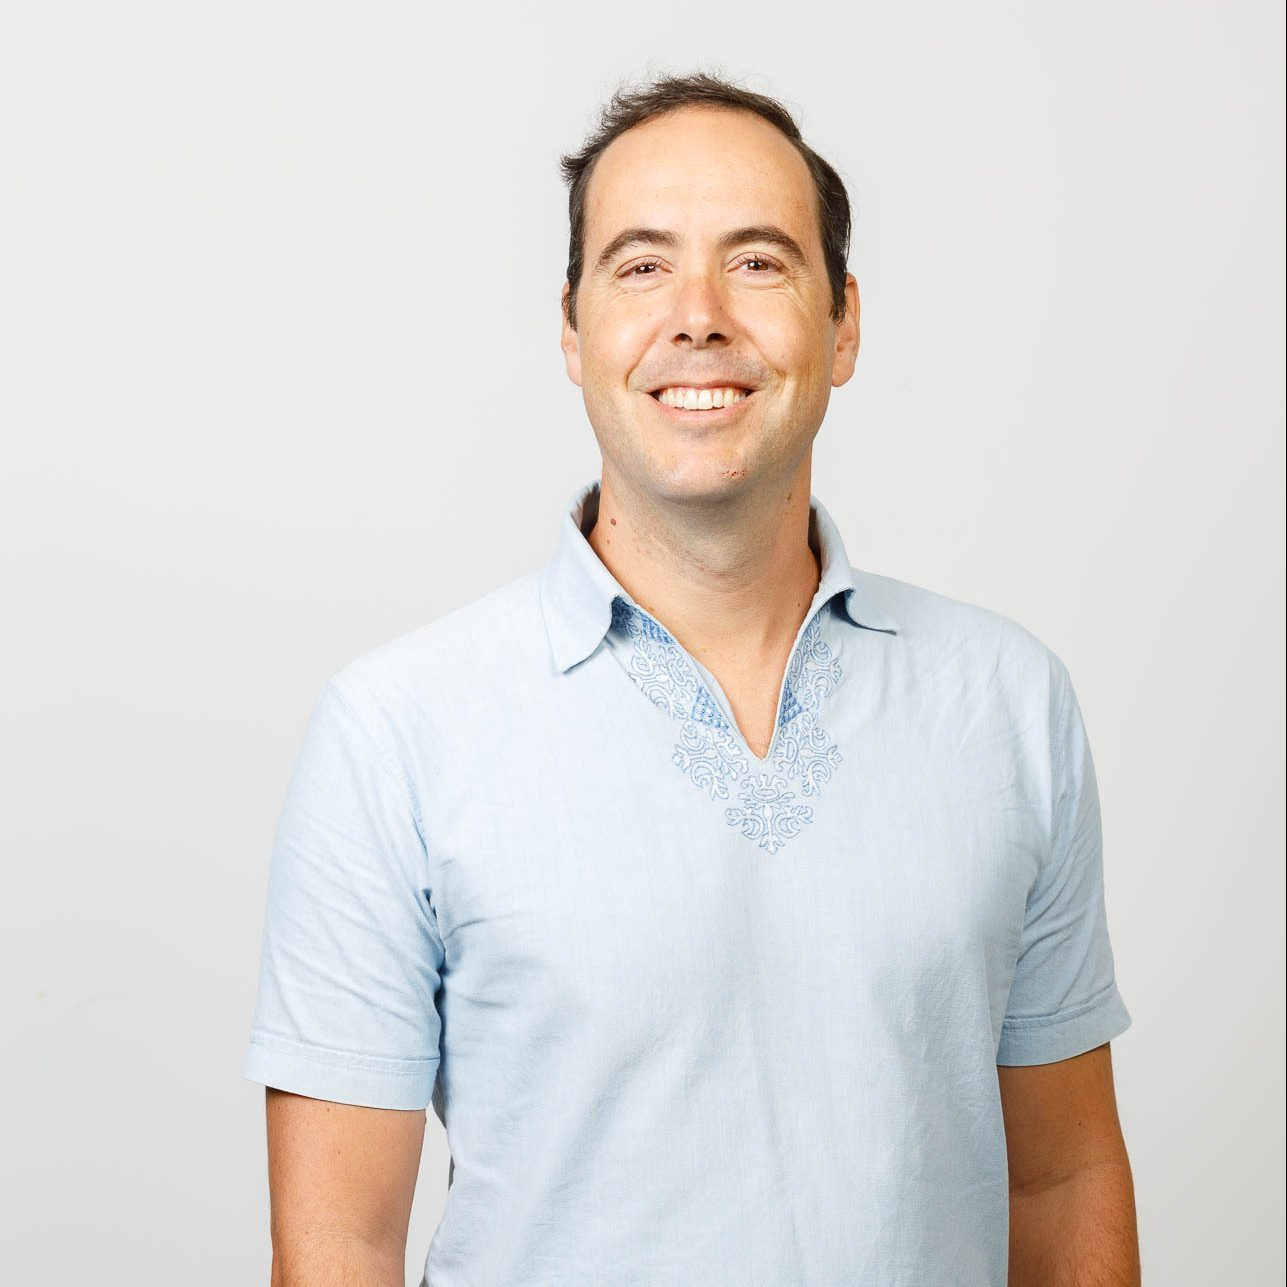 Marco Miranda - QA Analyst